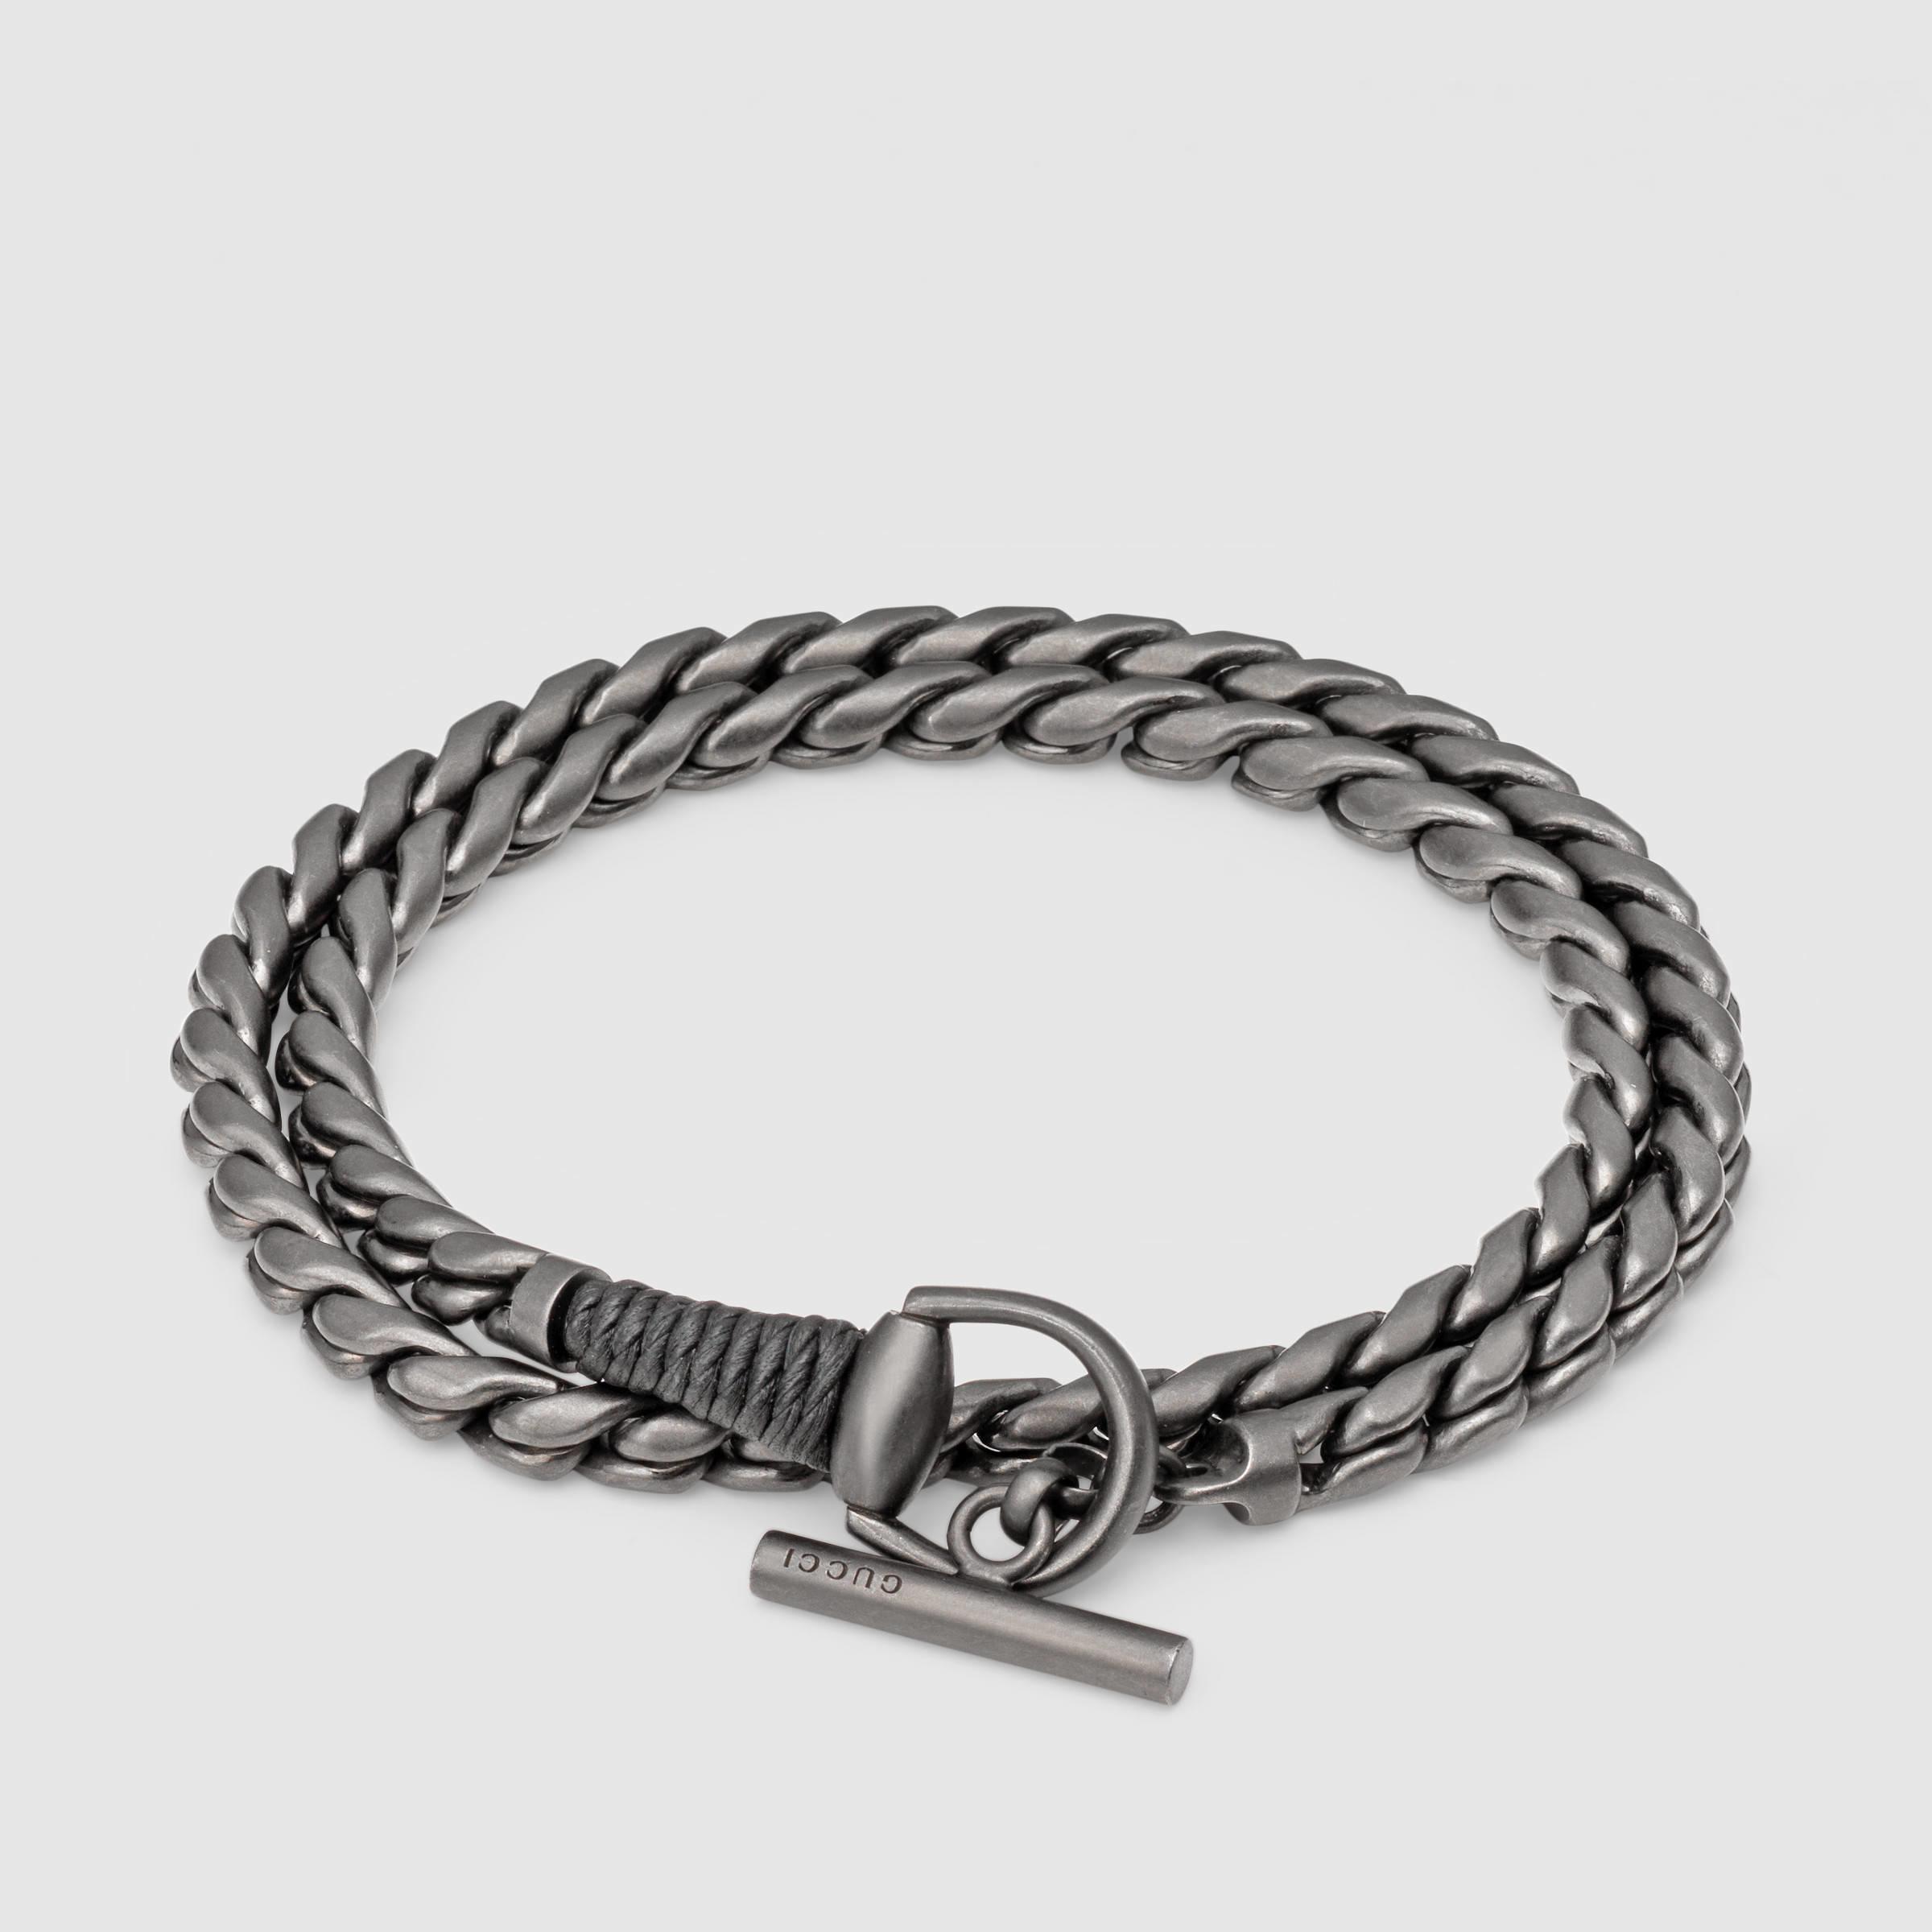 Gucci chain bracelet - Metallic FlsY3LK